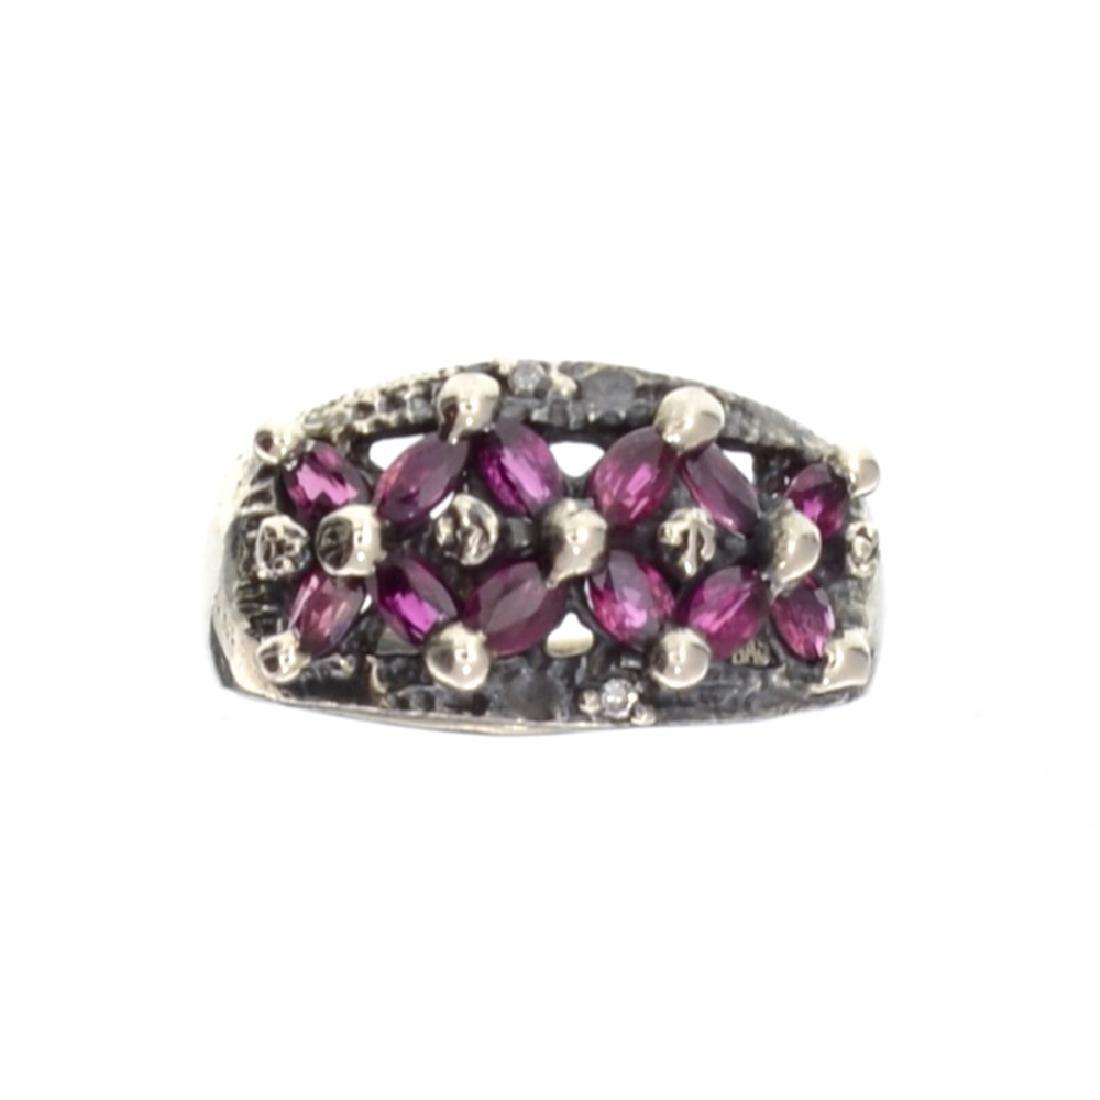 APP: 0.5k Fine Jewelry Designer Sebastian 0.84CT